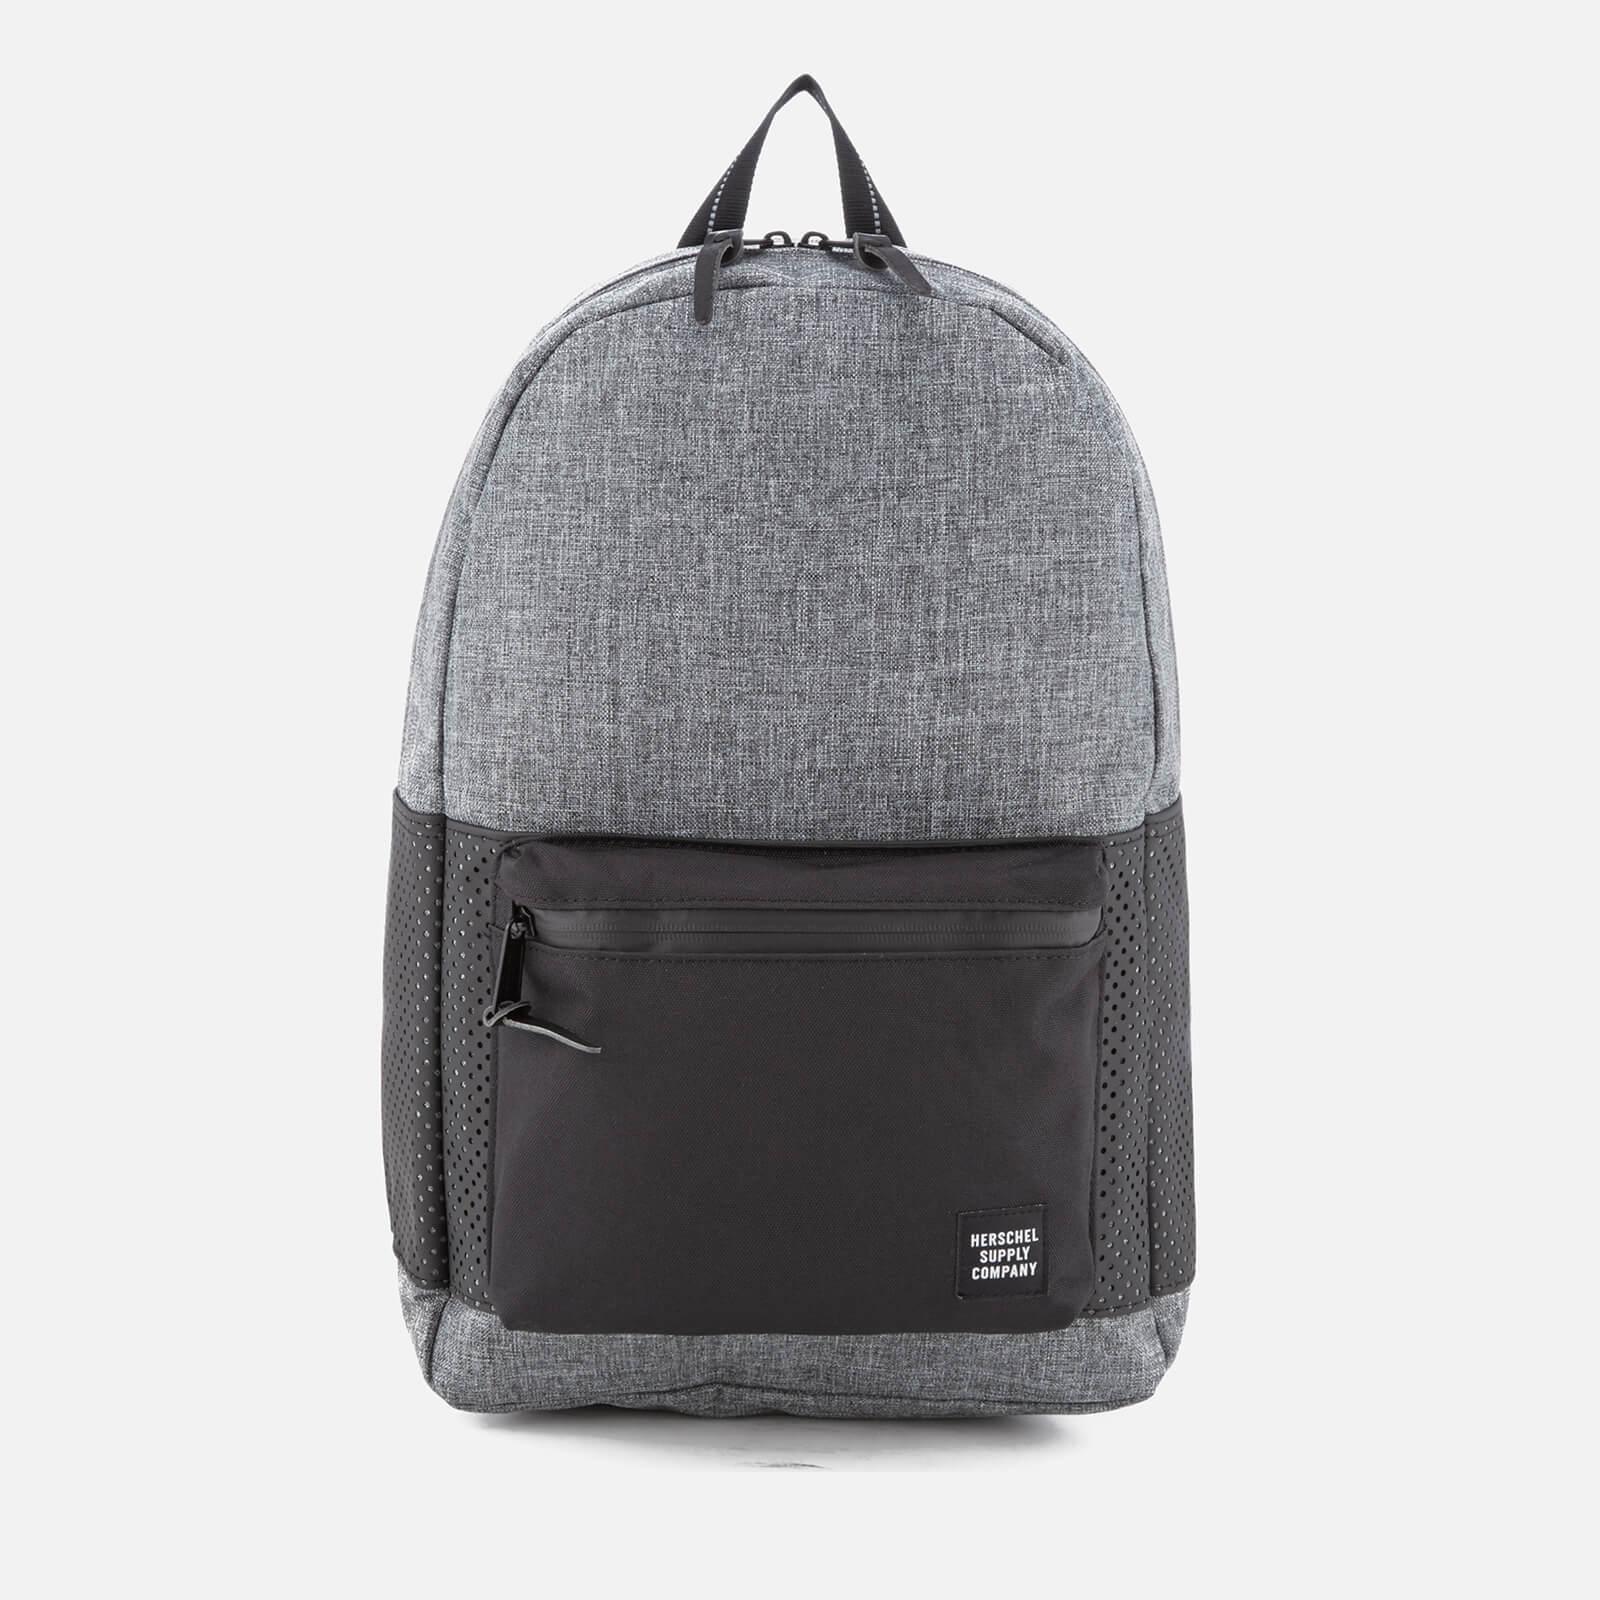 b72ae5e073 Herschel Supply Co. Aspect Settlement Backpack - Raven Crosshatch Black -  Free UK Delivery over £50